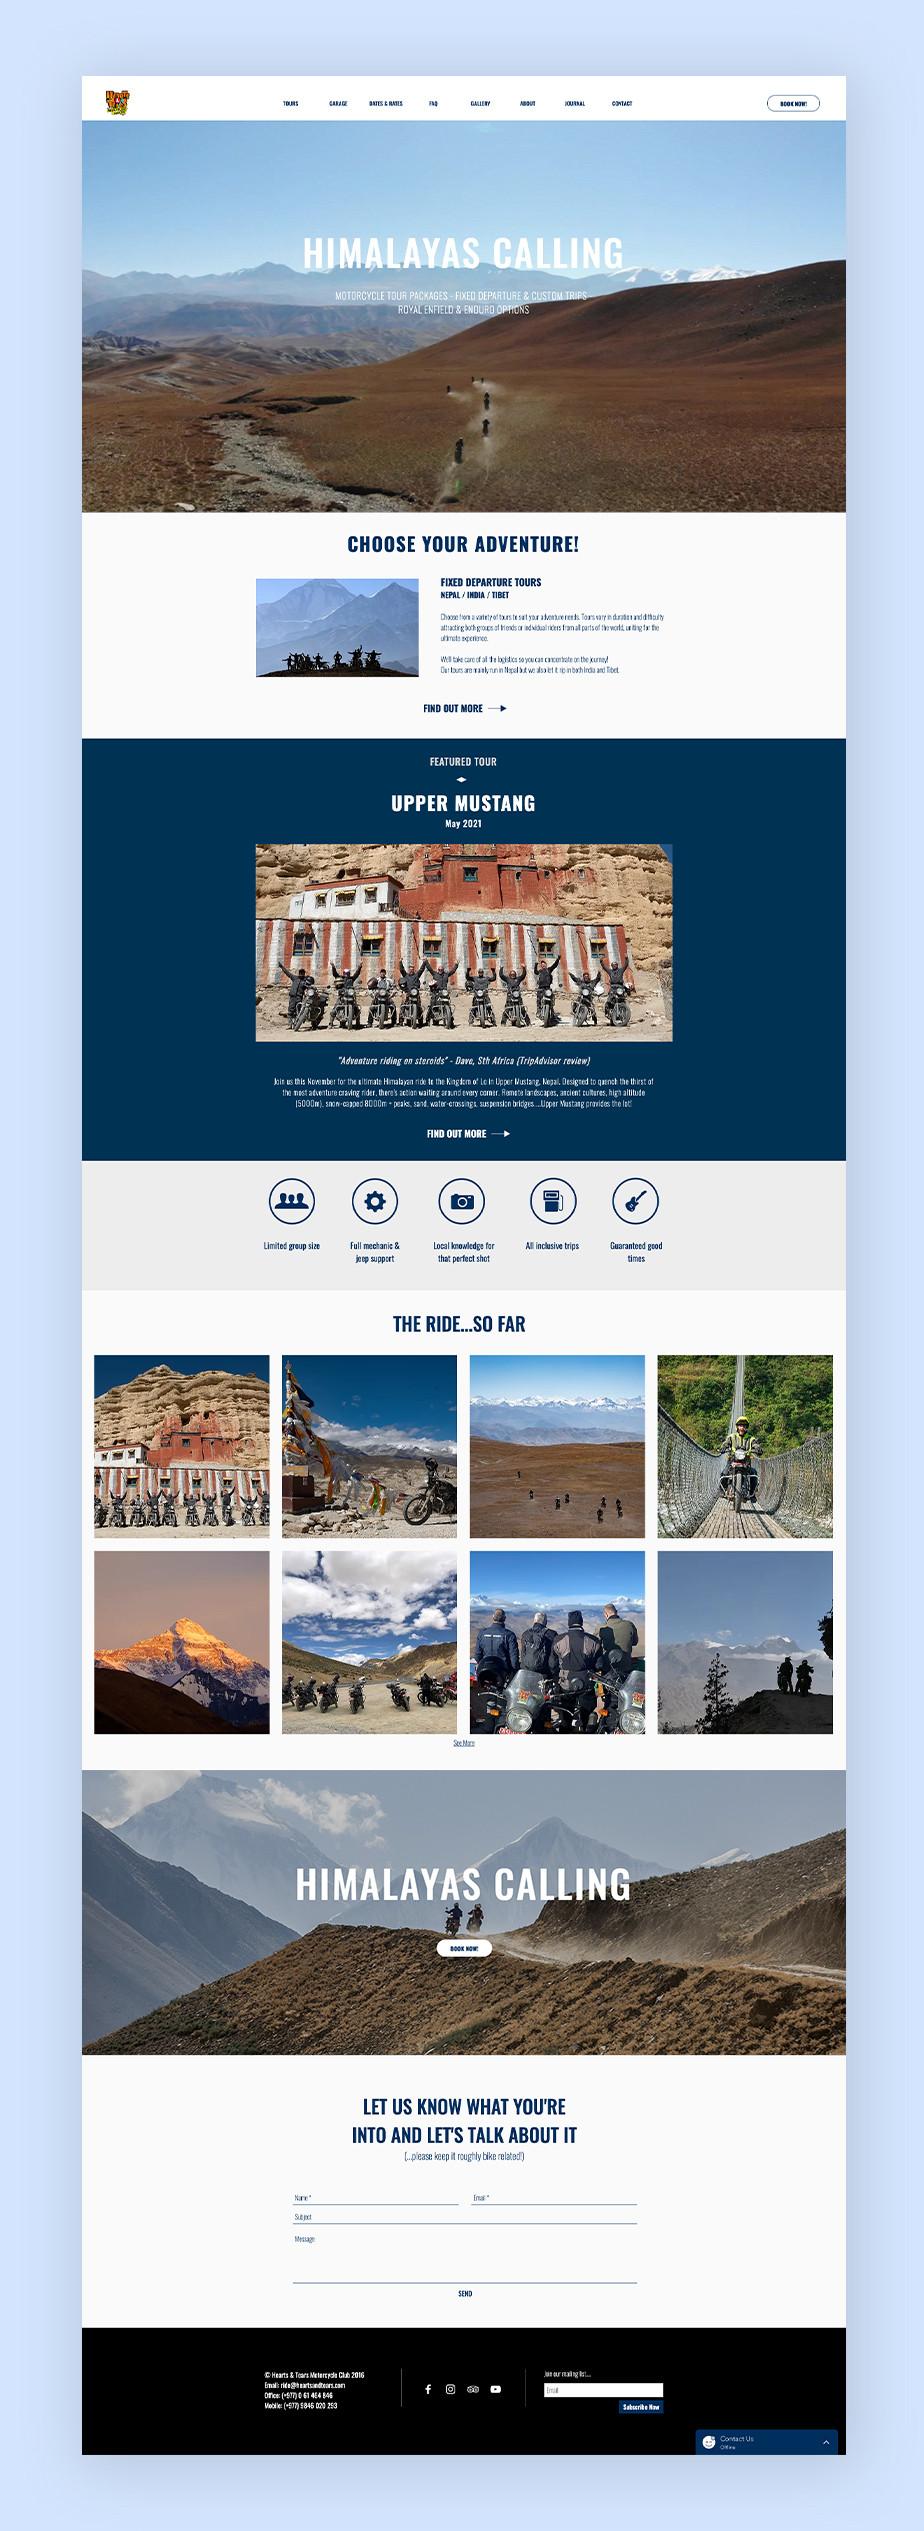 Exemplo de site que utiliza o Wix Bookings: clube de motociclistas Hearts and Tears